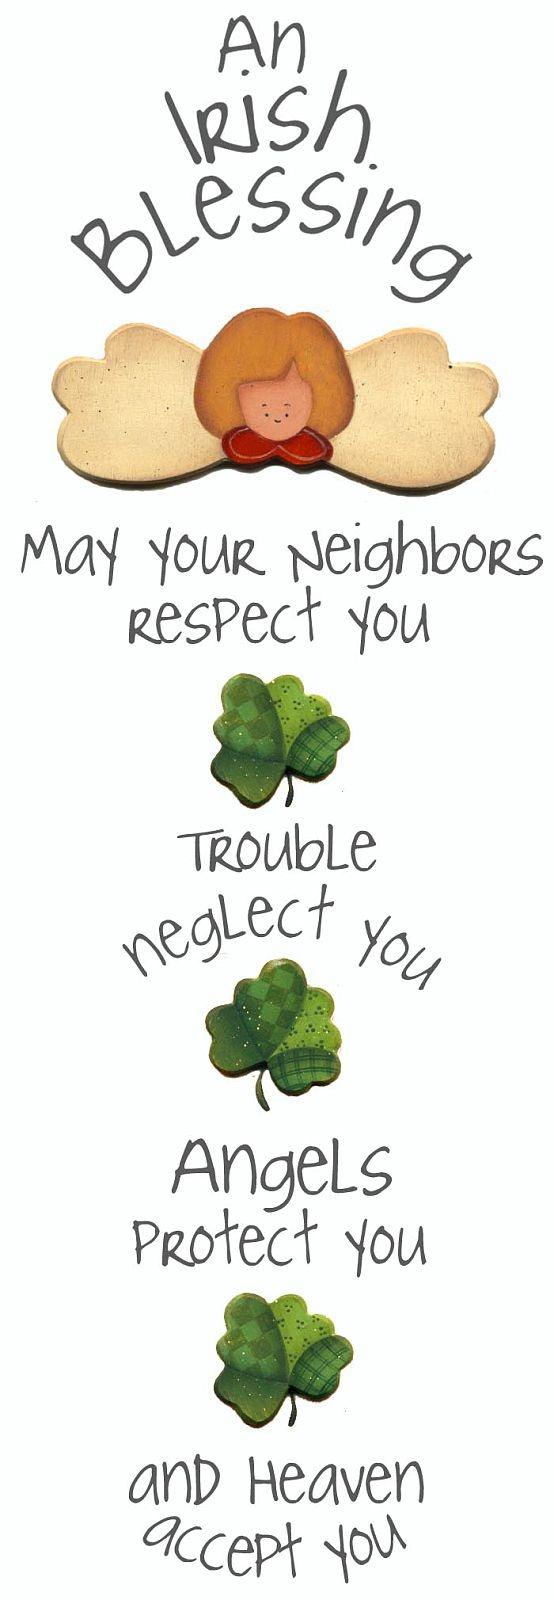 An Irish blessing. …